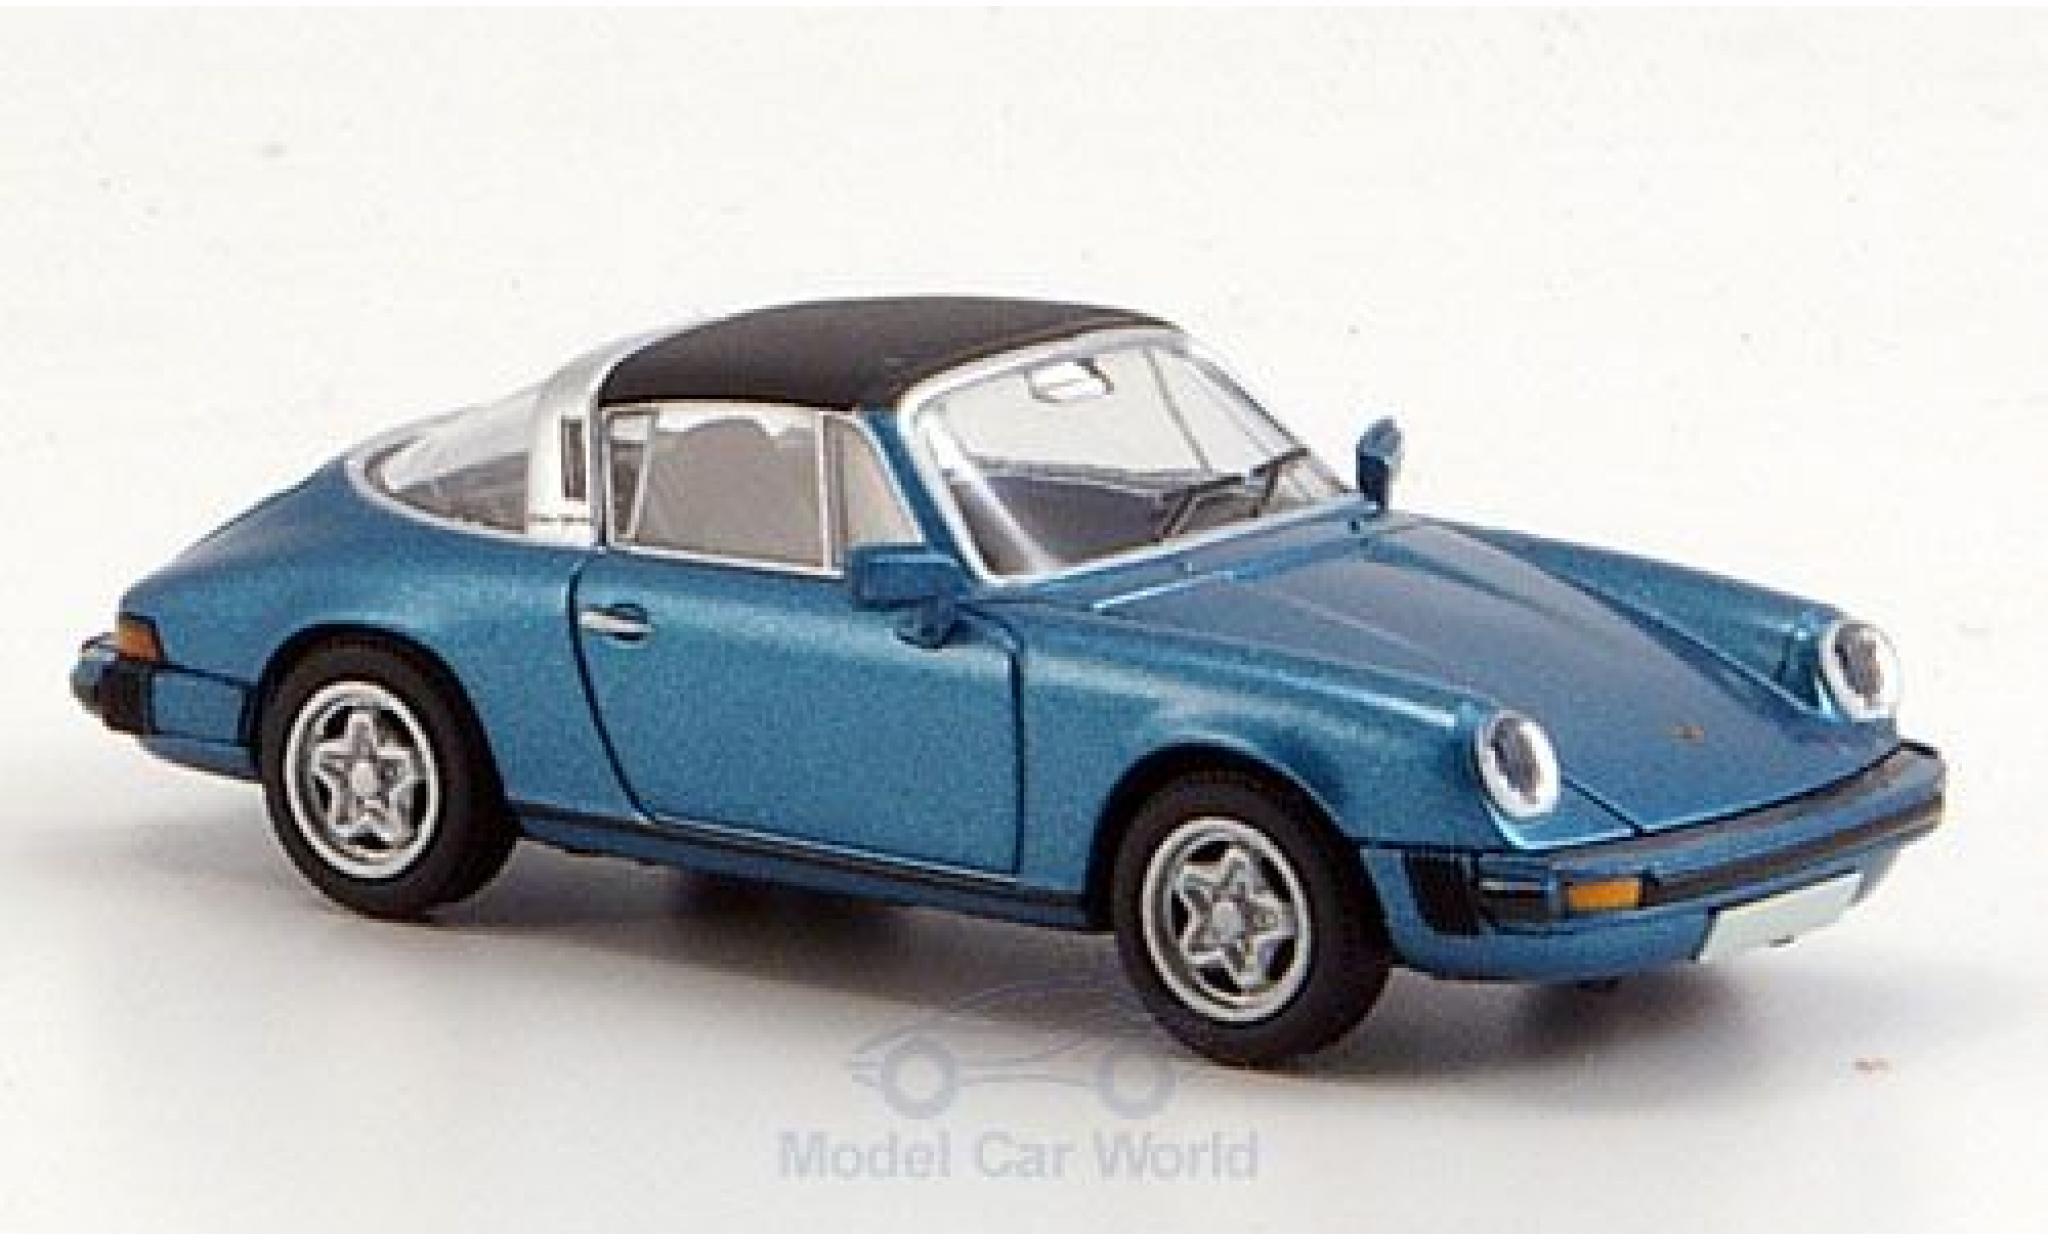 Porsche 911 1/87 Brekina Targa (G-Modell) métallisé bleue Dach abnehmbar